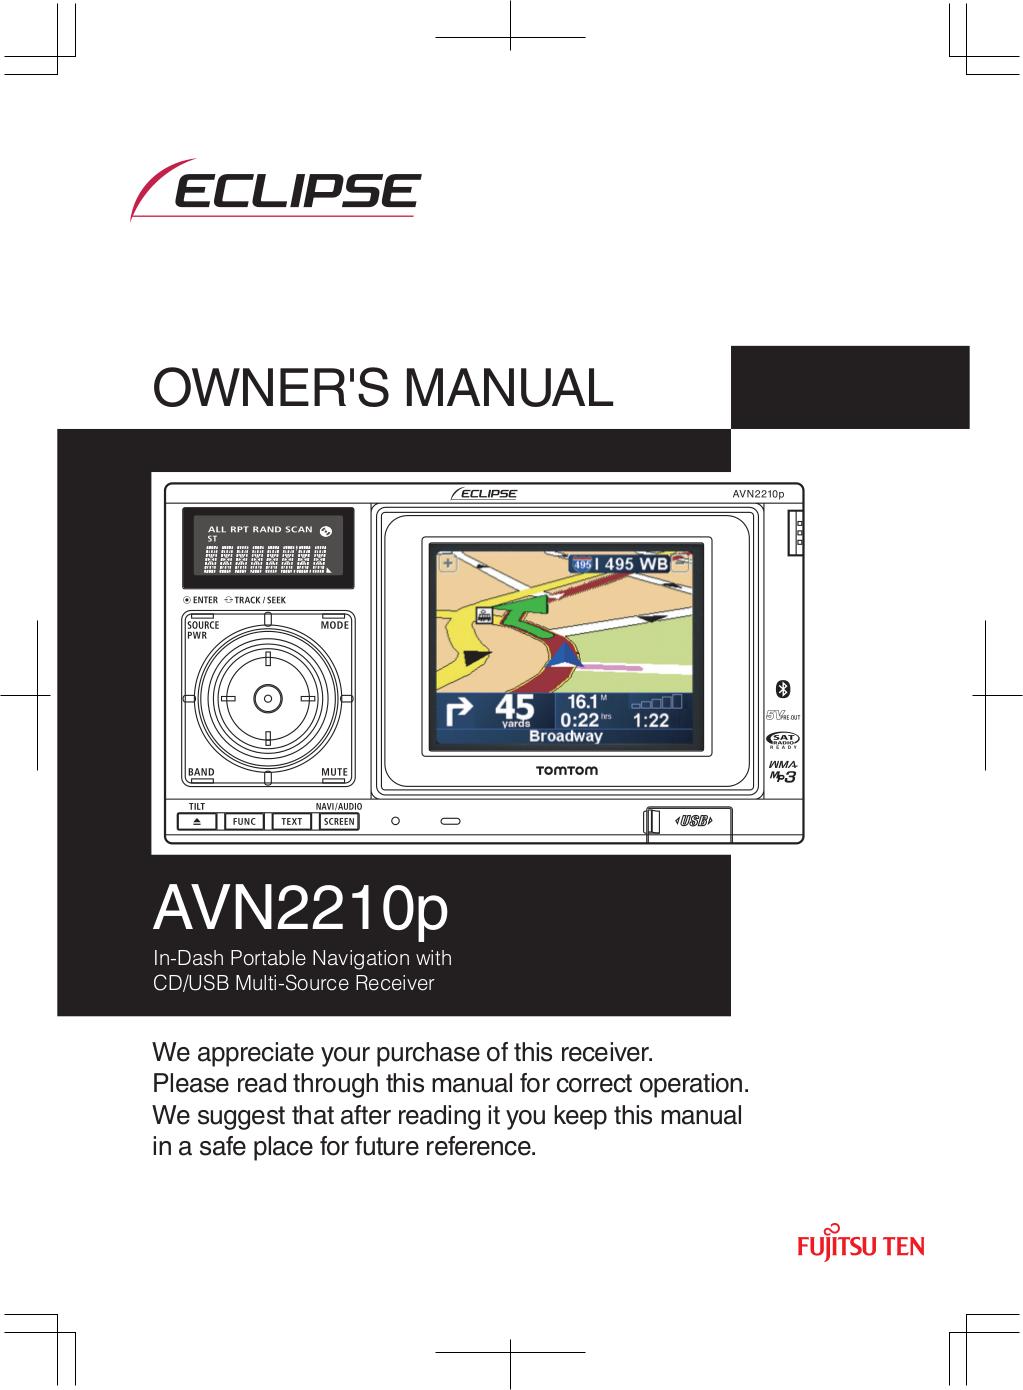 Eclipse Avn2454 Wiring Diagram Trusted Tomtom Avn2210p Car Diagrams Explained U2022